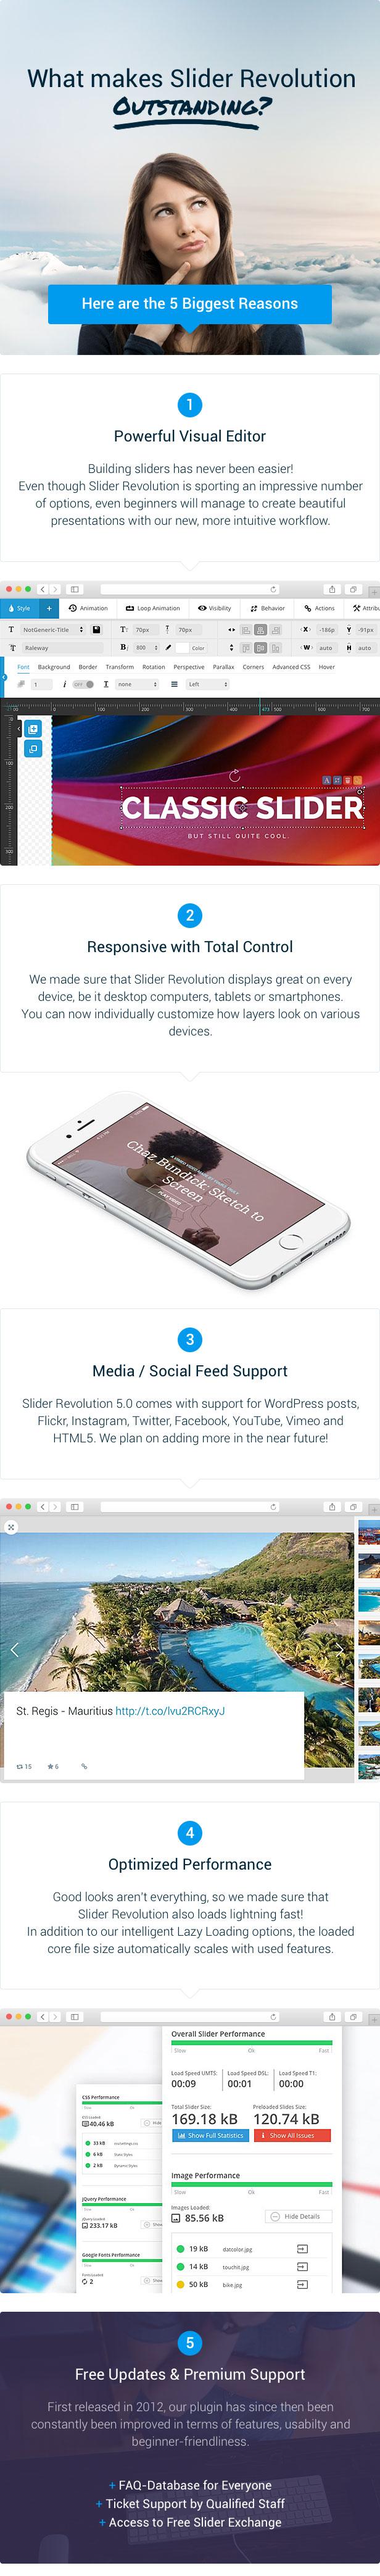 slider9 1 - Slider Revolution Responsive WordPress Plugin